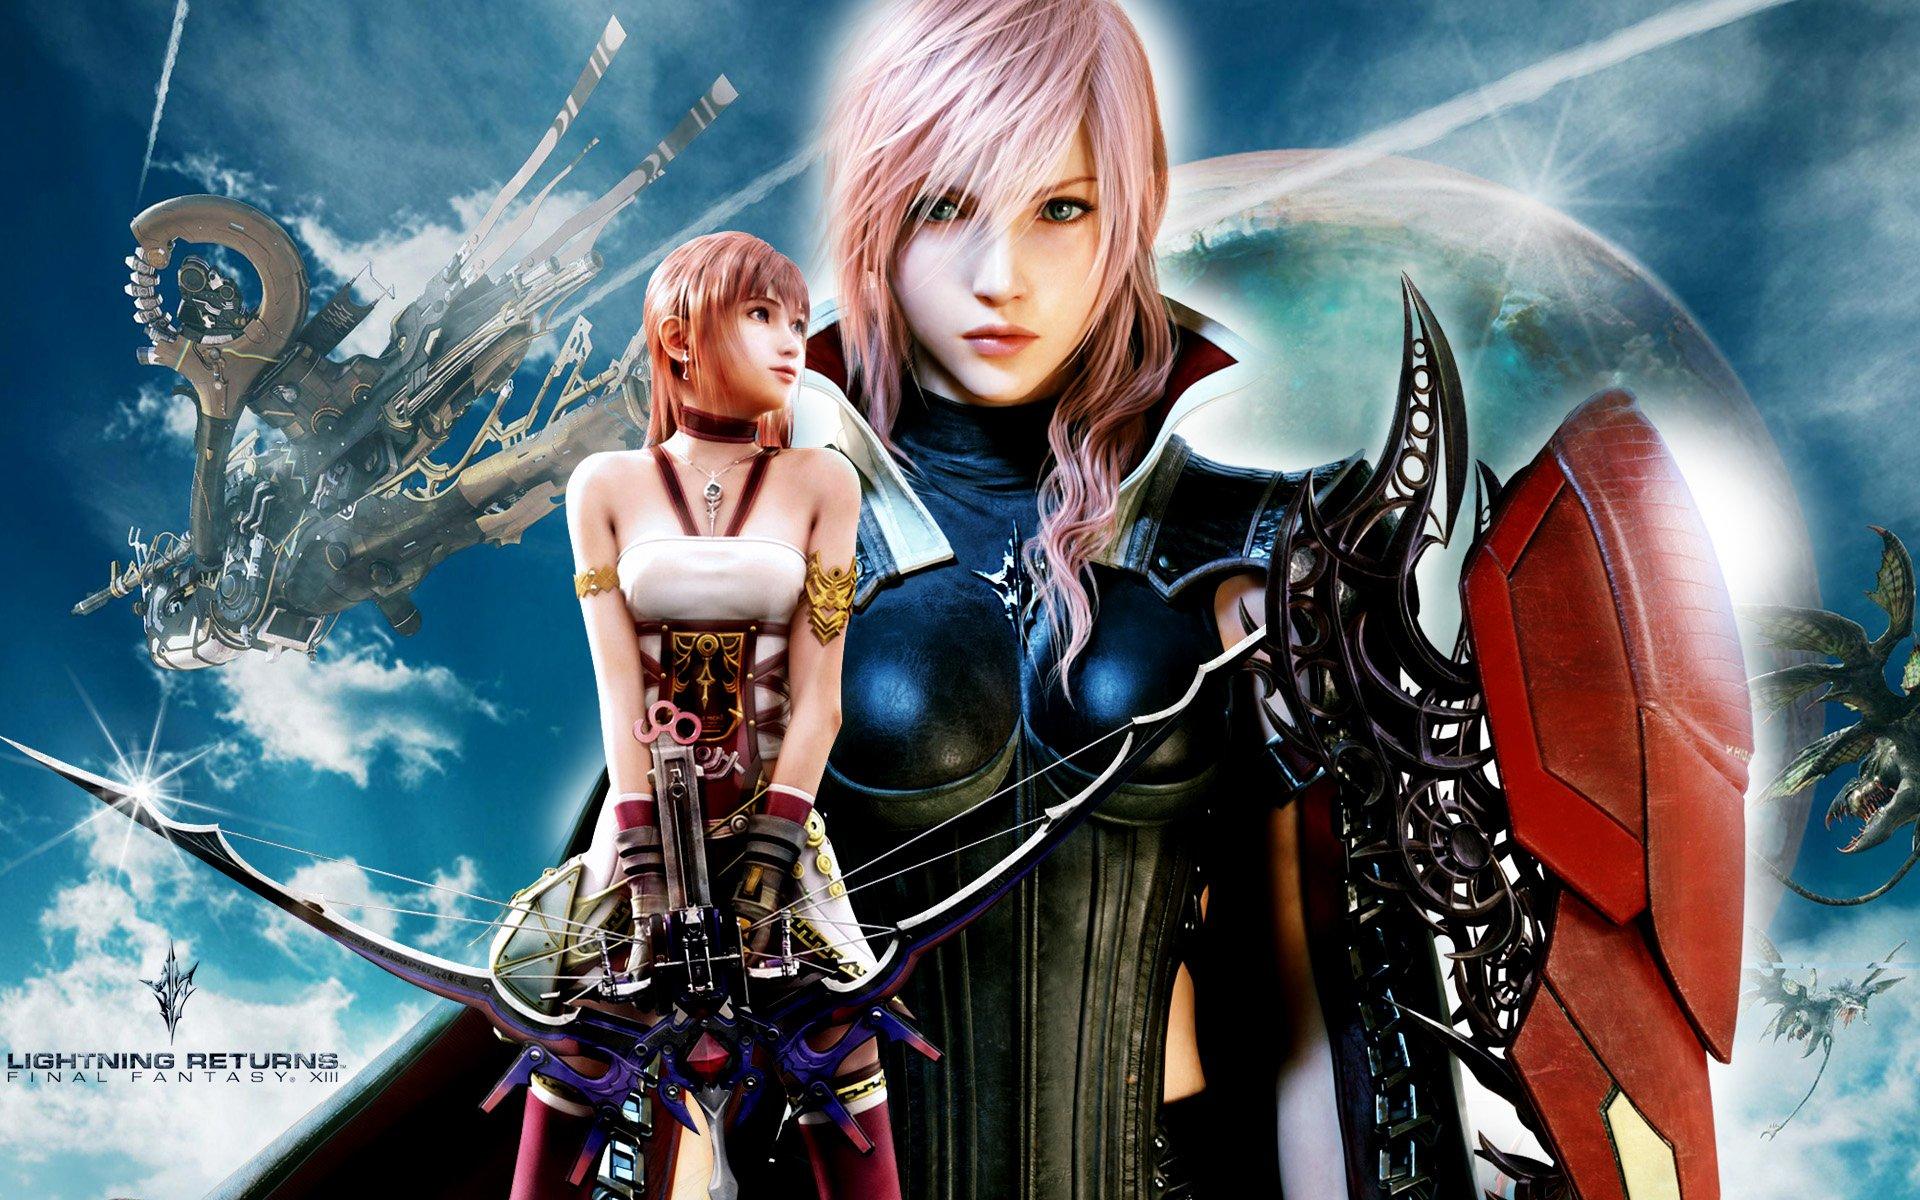 Lightning Returns Final Fantasy XIII Wallpapers HD Wallpapers 1920x1200